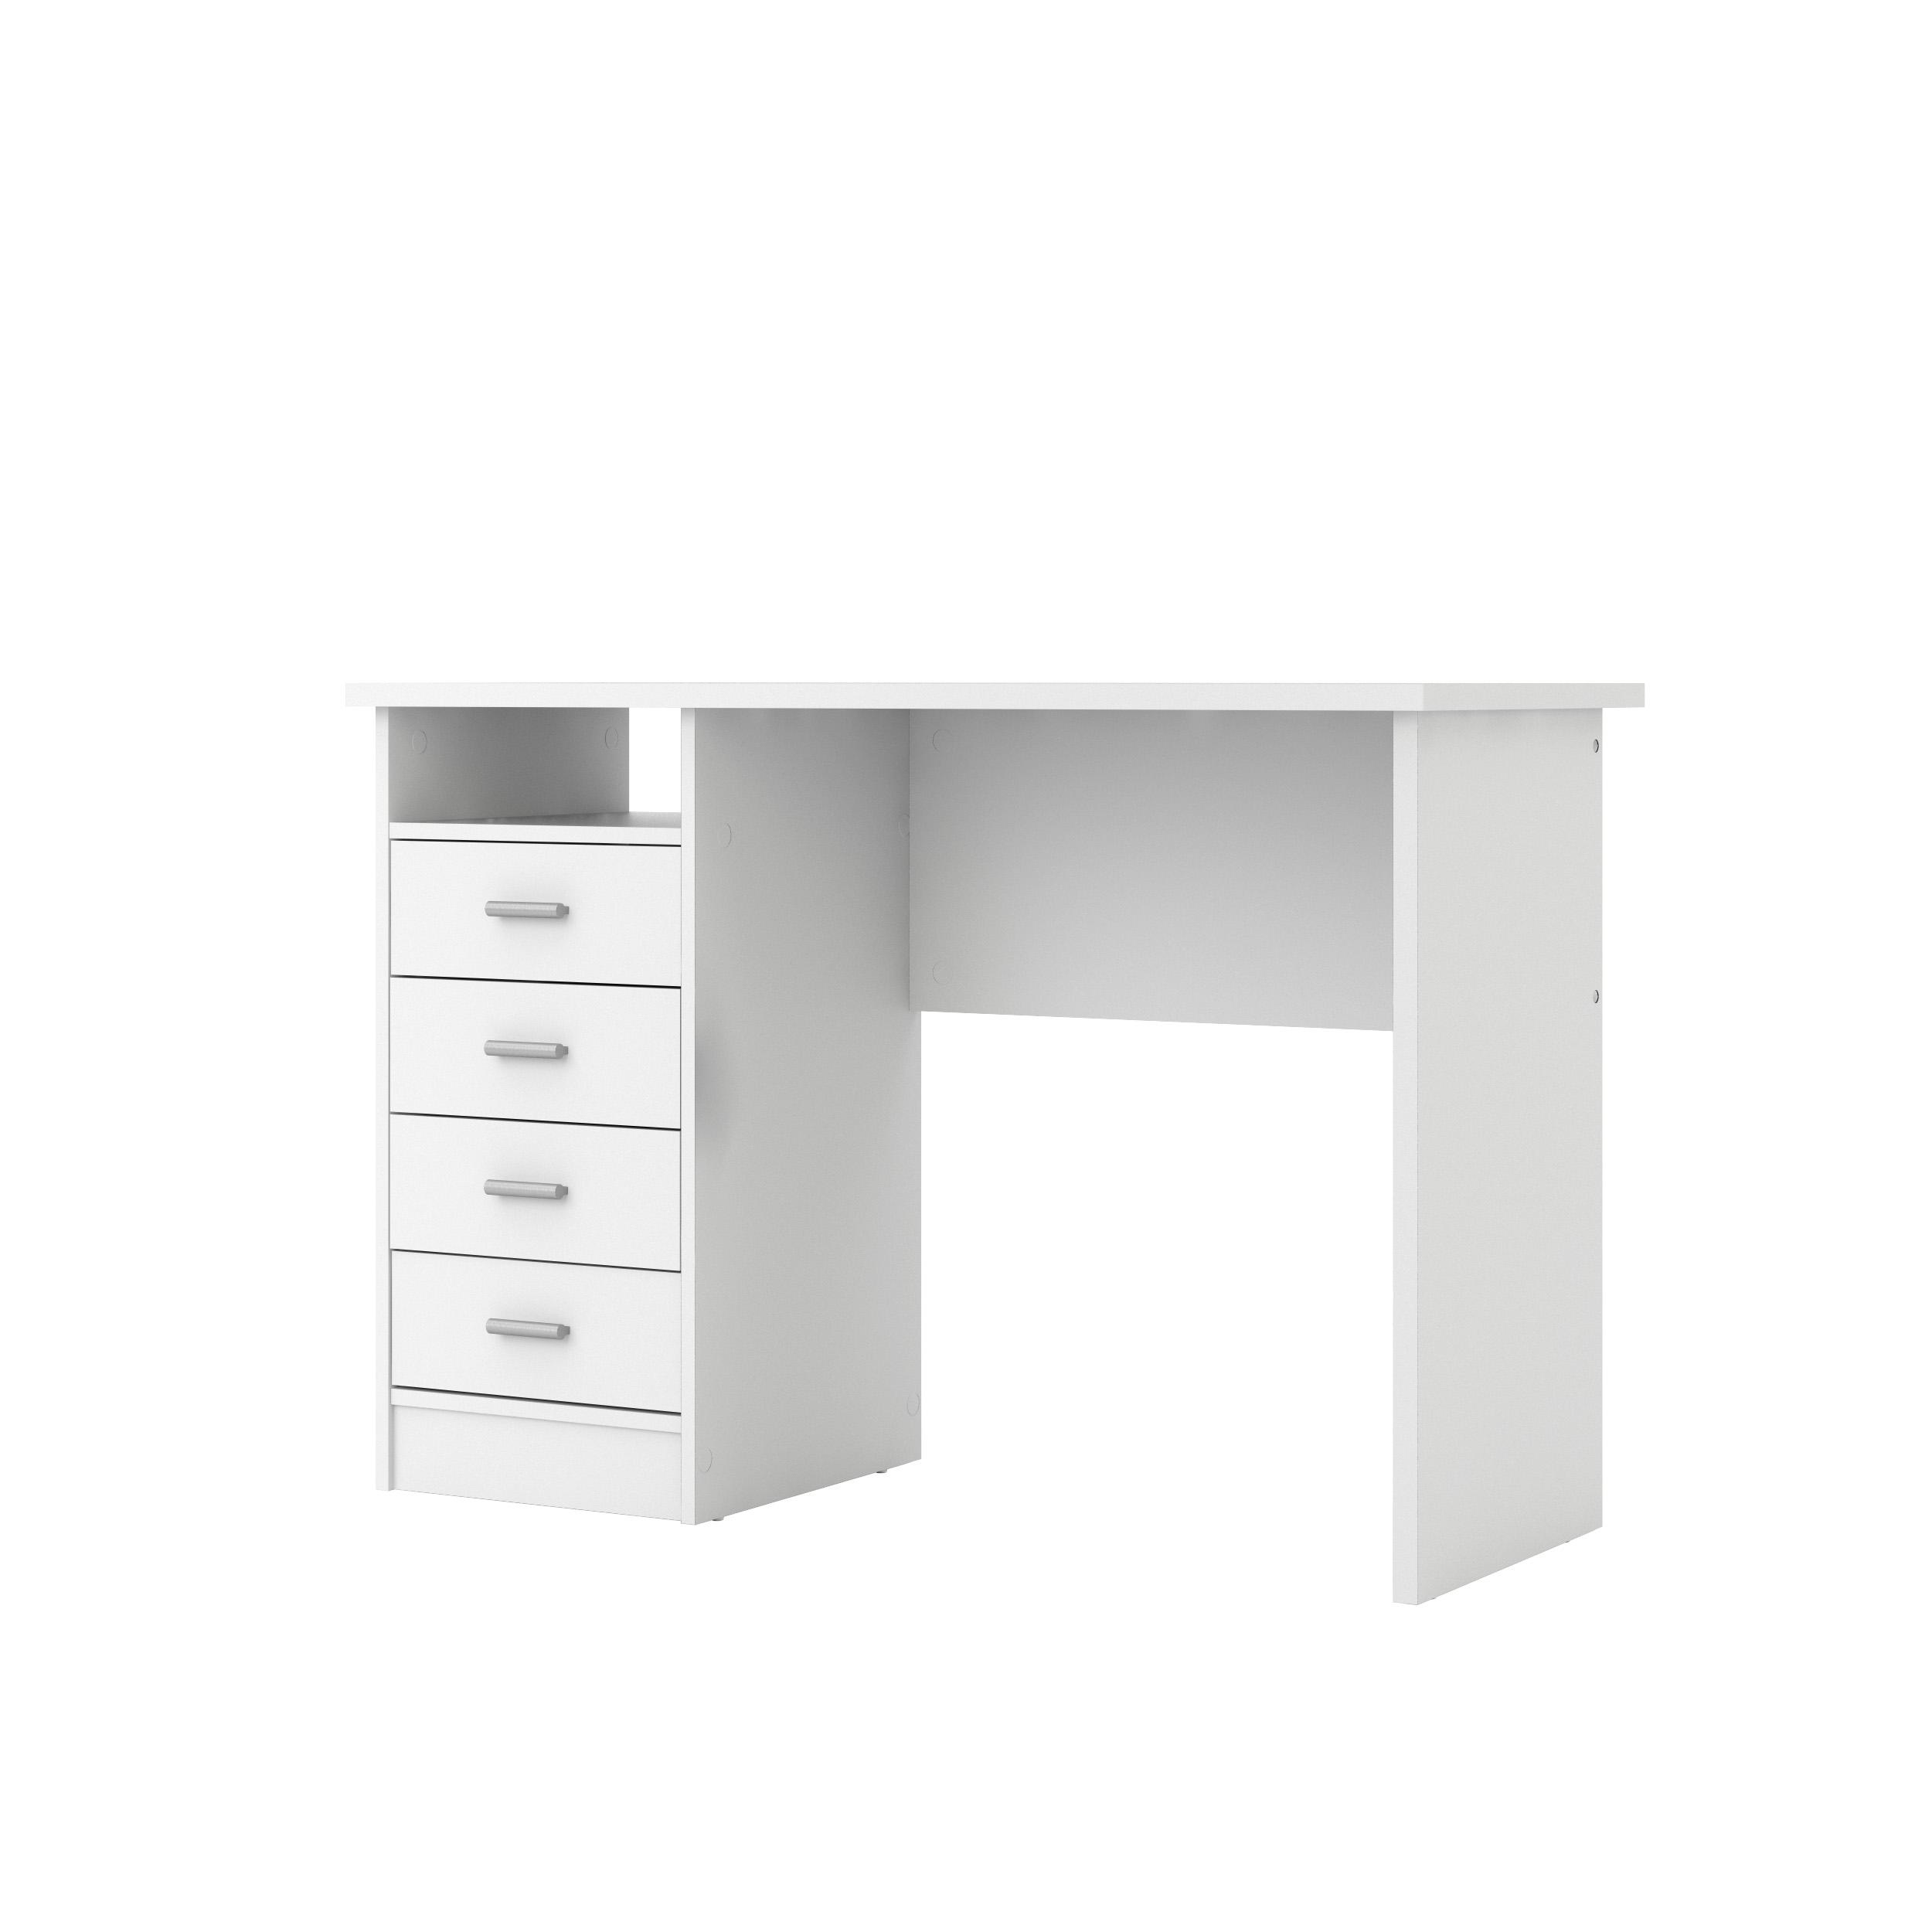 Tvilum Warner Computer Desk with Drawers, White Finish ...